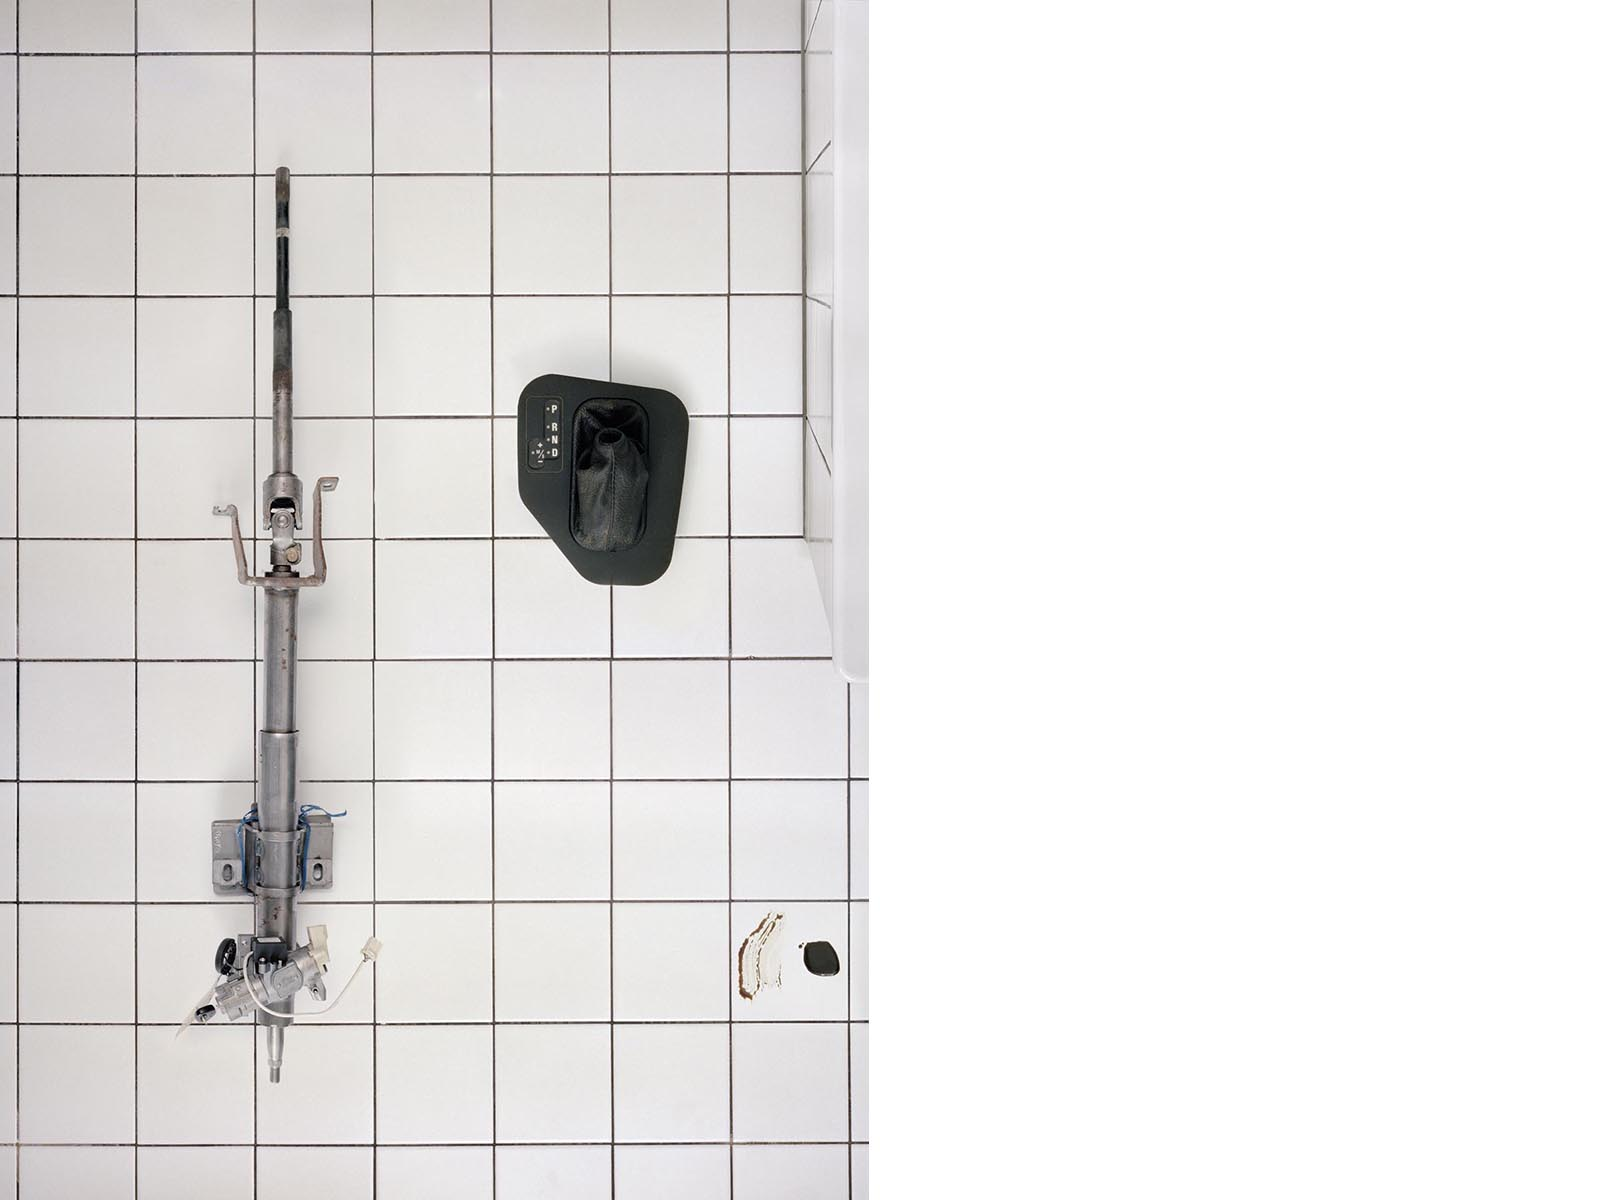 Bist Du bereit?, 2011, 91 x 66 cm, Lightbox